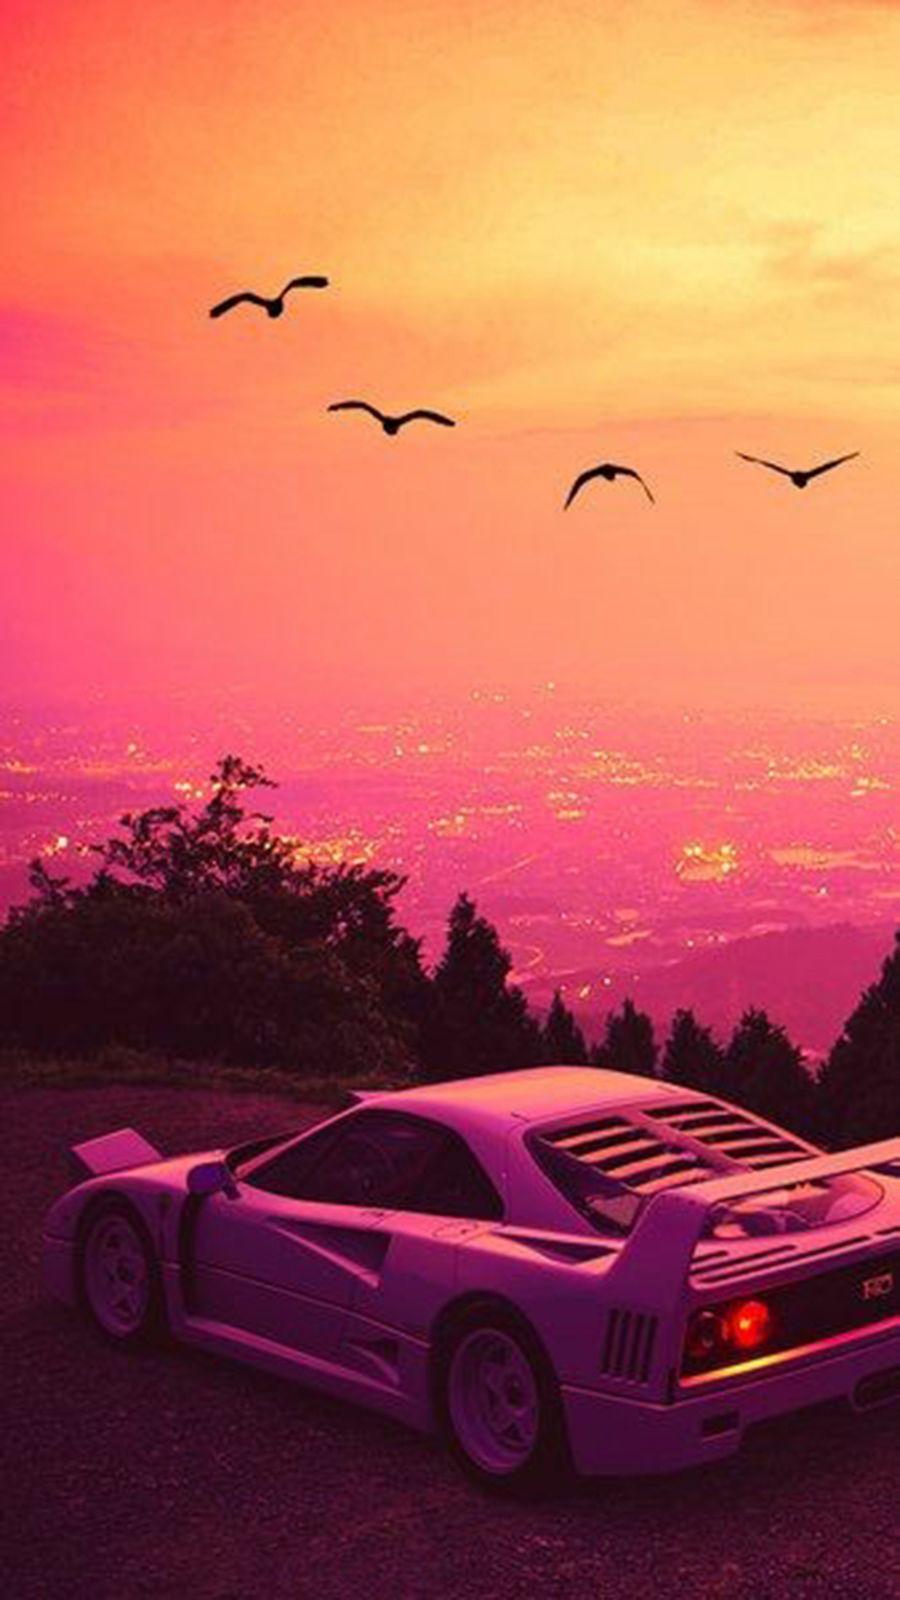 Car Vehicle Ferrari F40 Sports Car Supercar Sky In 2020 Vaporwave Retro Futurism Retro Waves